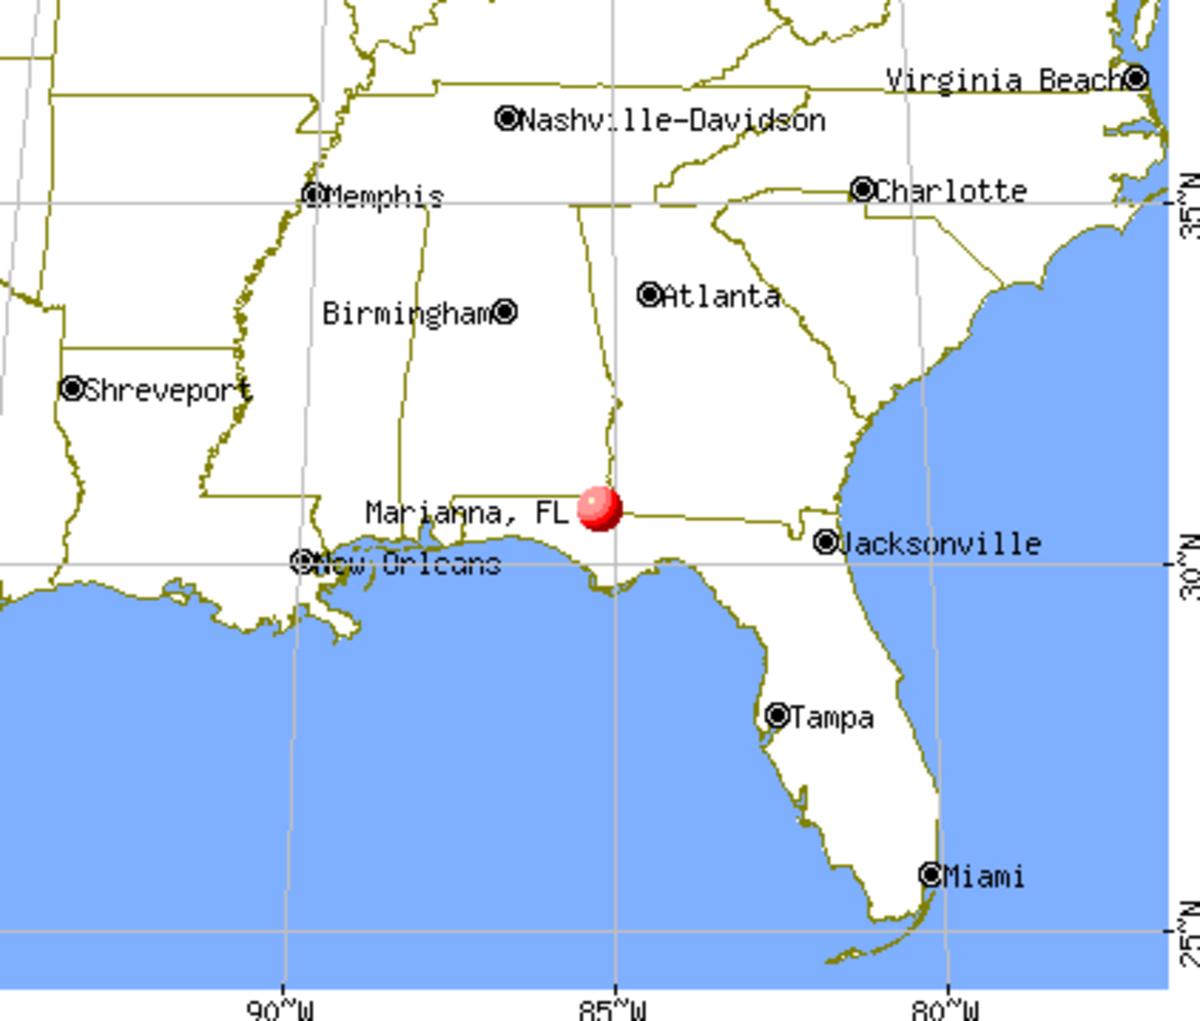 Marianna, Florida